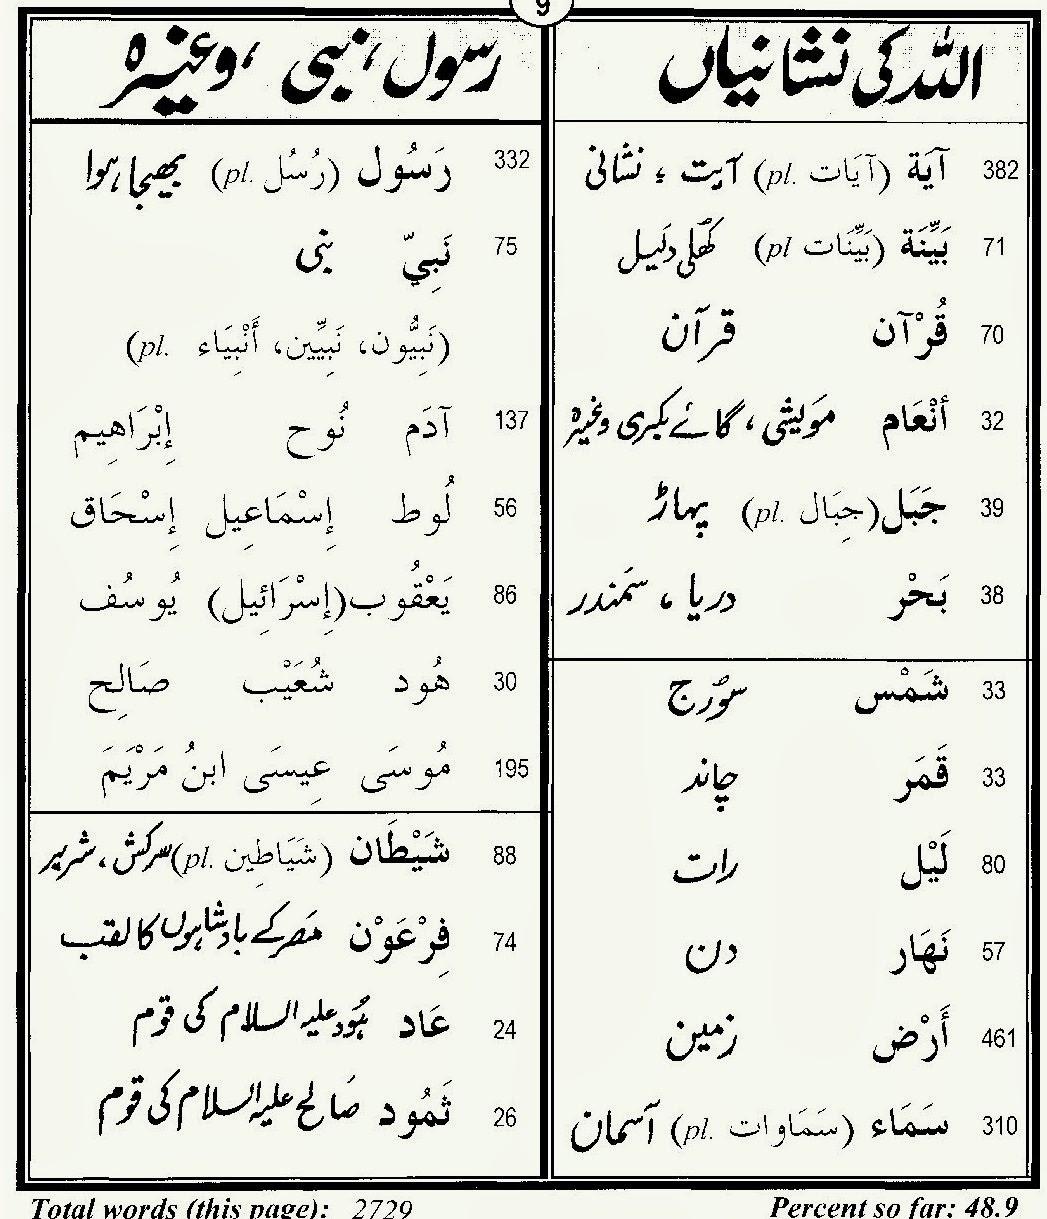 Top 10 Punto Medio Noticias | Word Meaning In Urdu Arabic